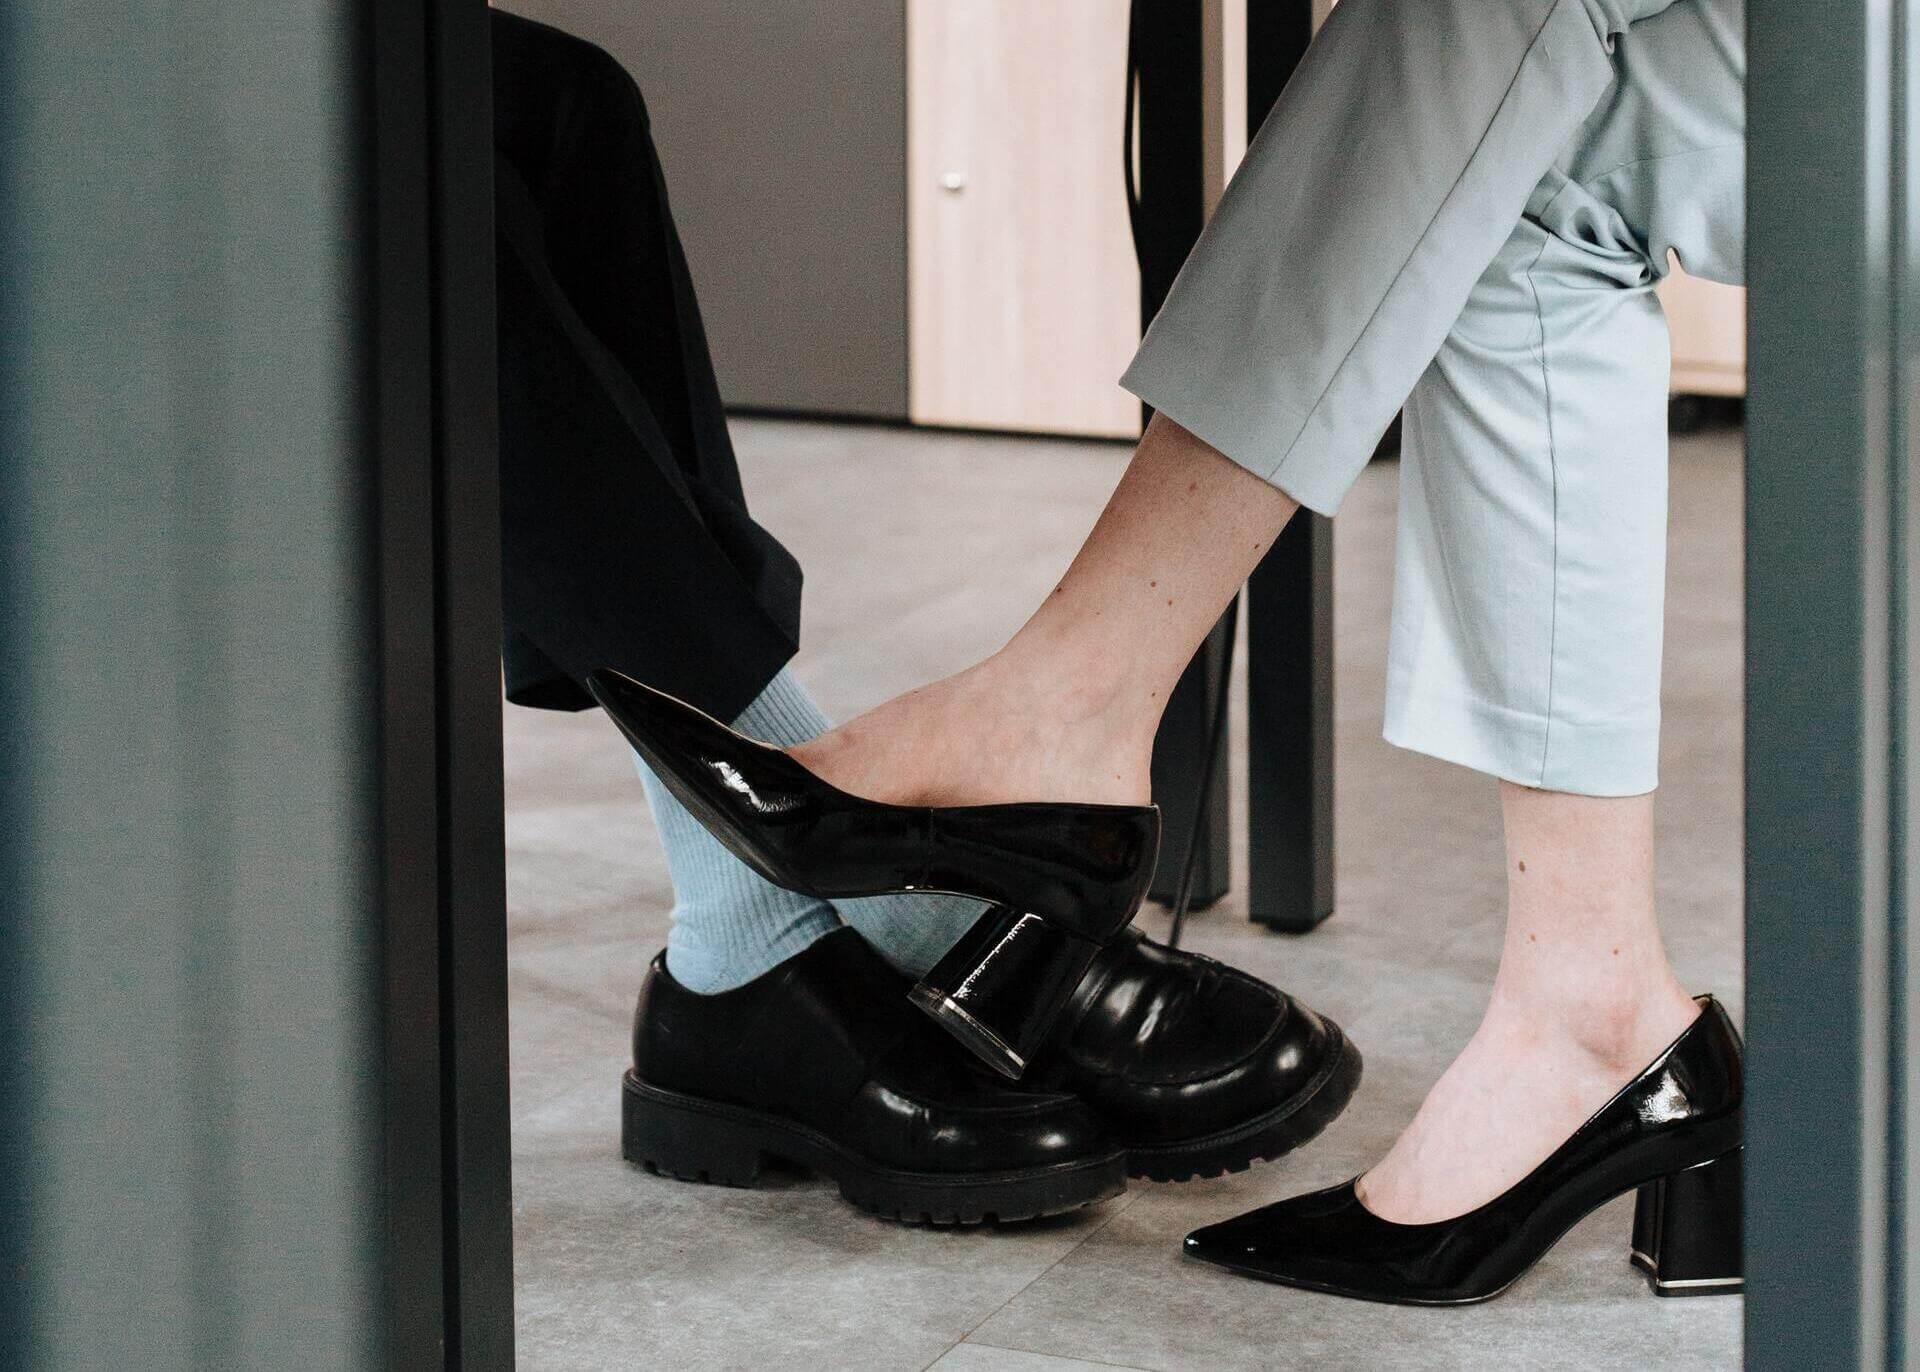 man an woman legs under the table